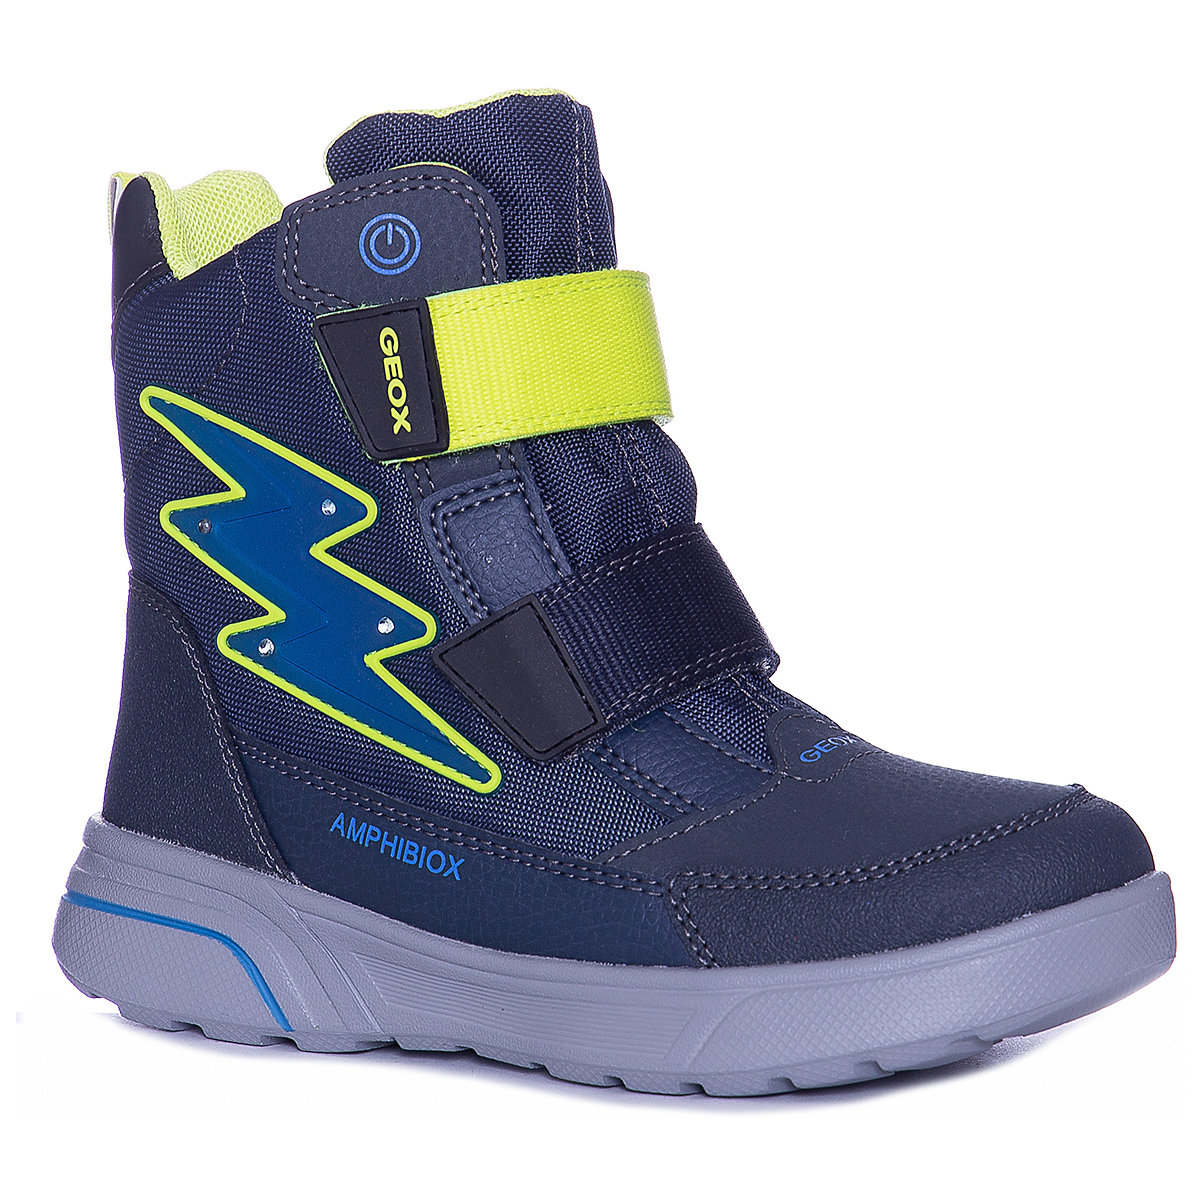 GEOX Boots 8786523 baby shoes For boy faux fur Winter цена в Москве и Питере